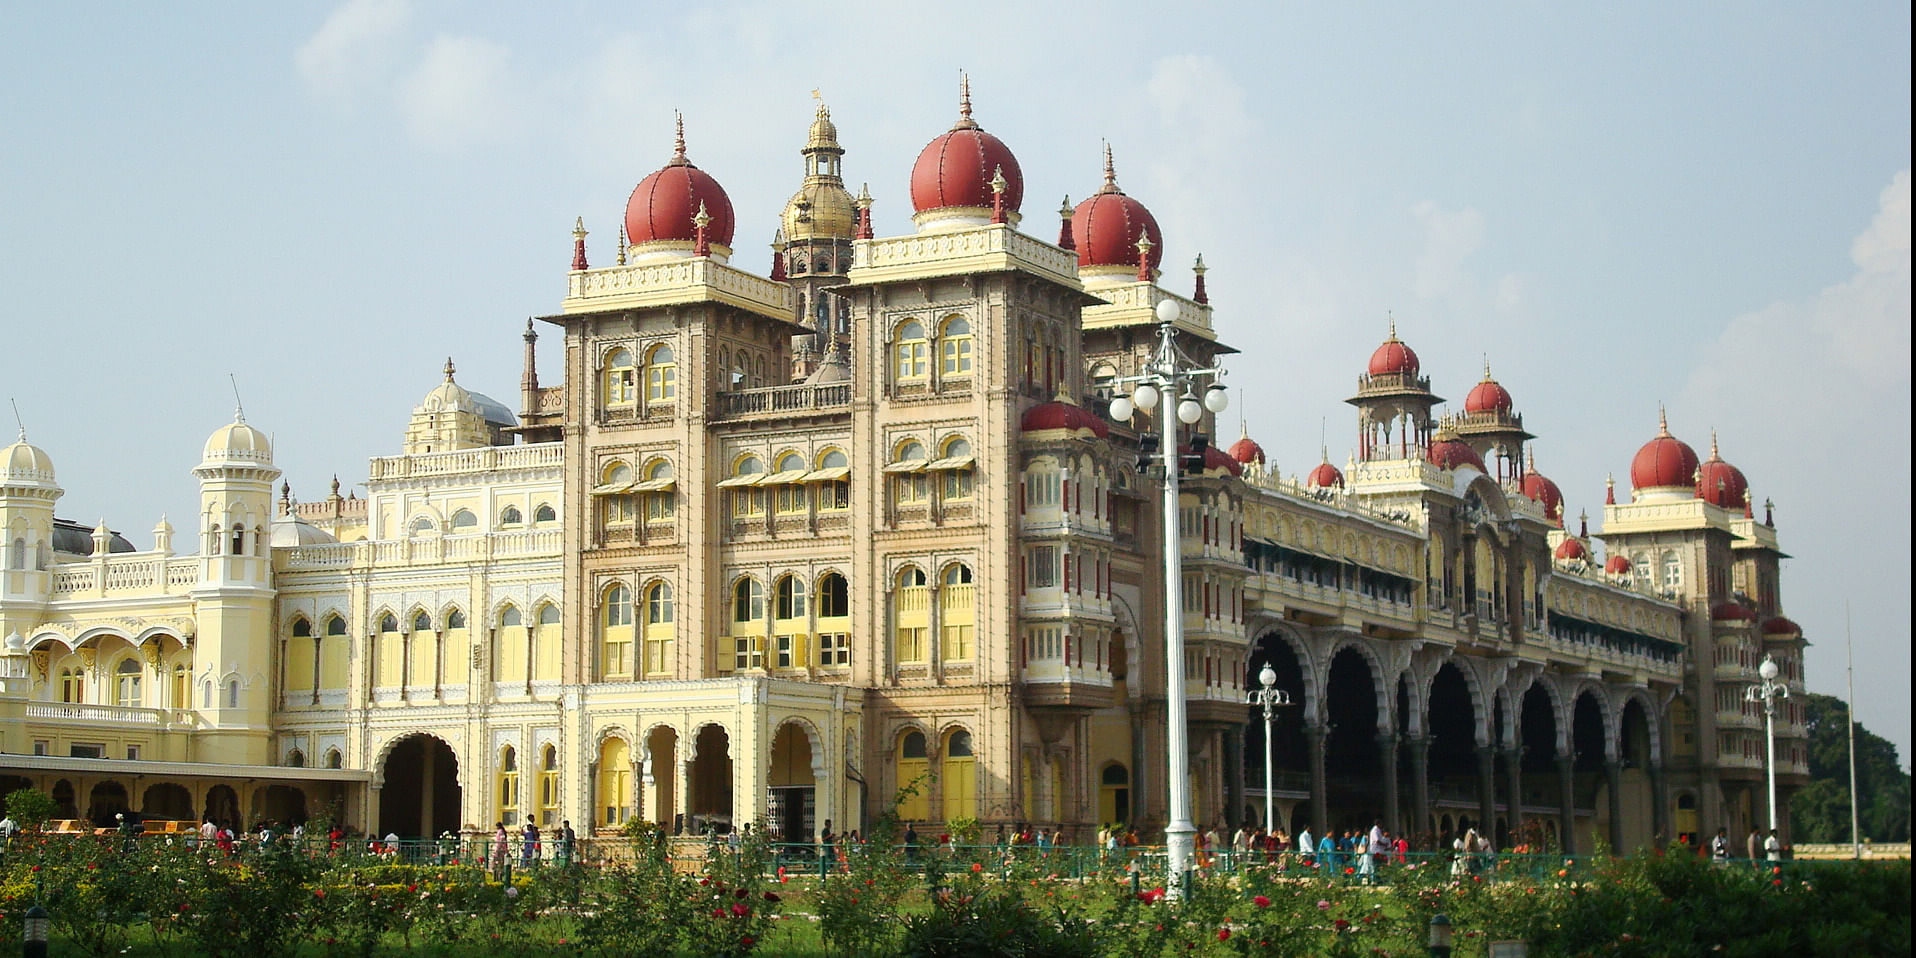 Image Source: https://upload.wikimedia.org/wikipedia/commons/6/62/Magnificient_Majestic_Mysore_Palace.JPG